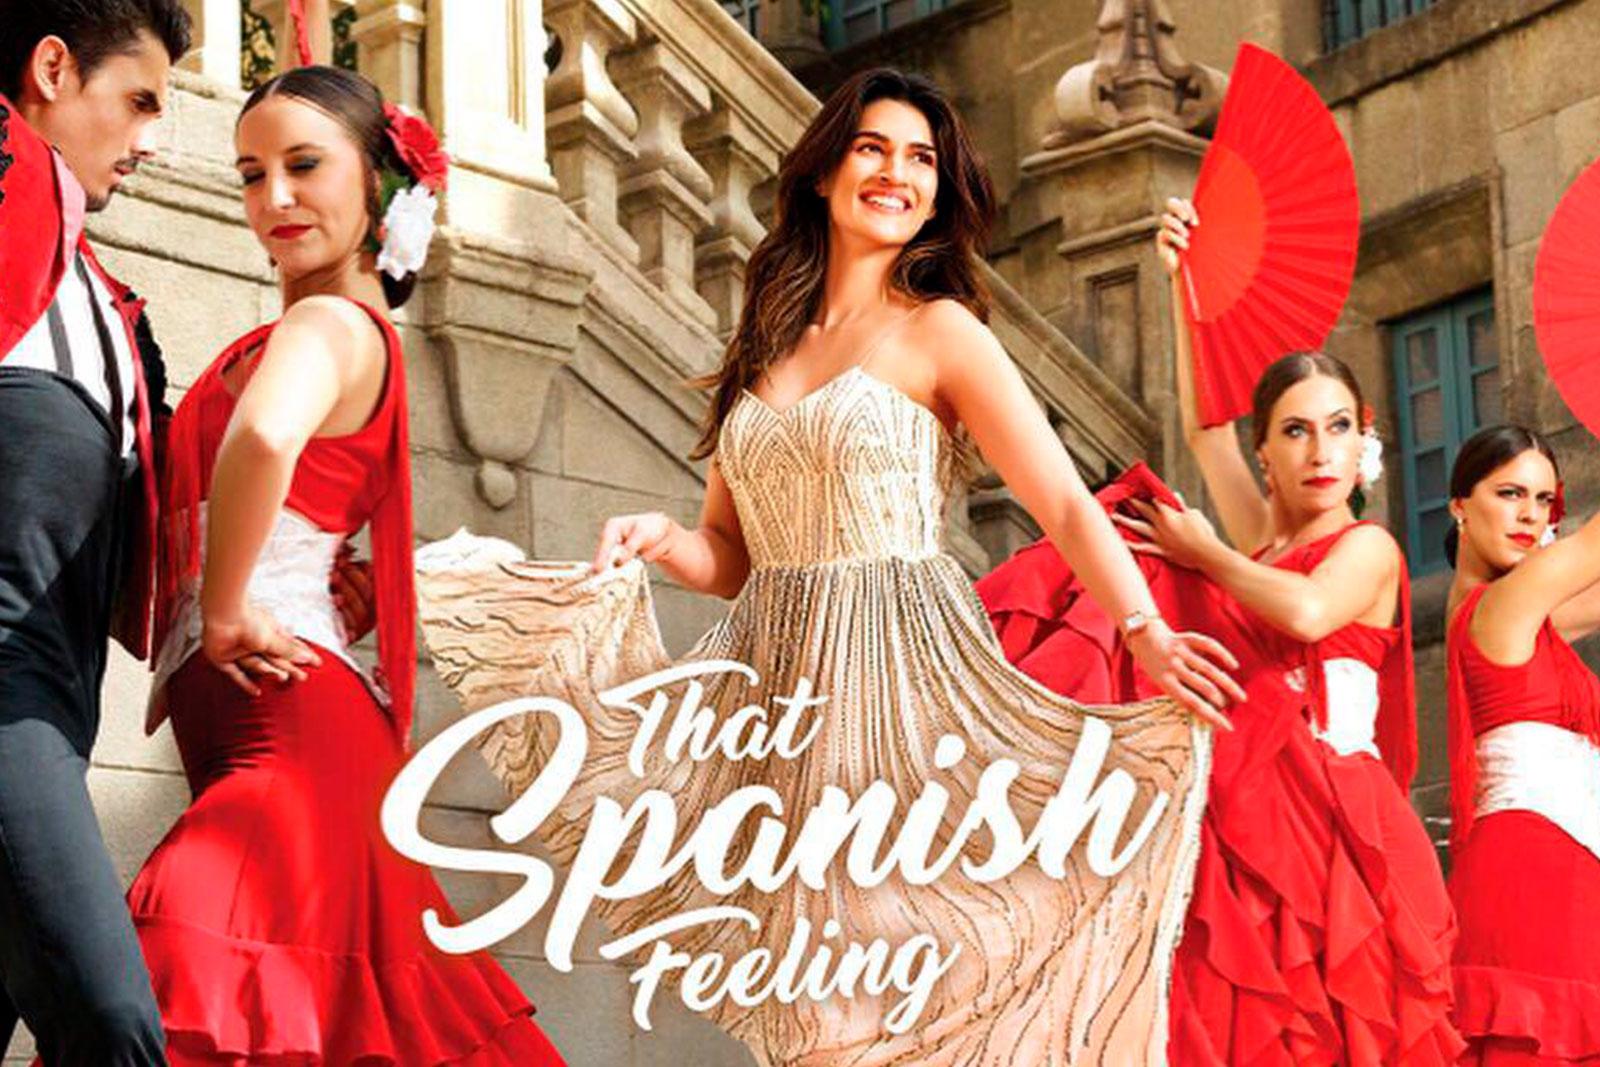 The Spanish feeling